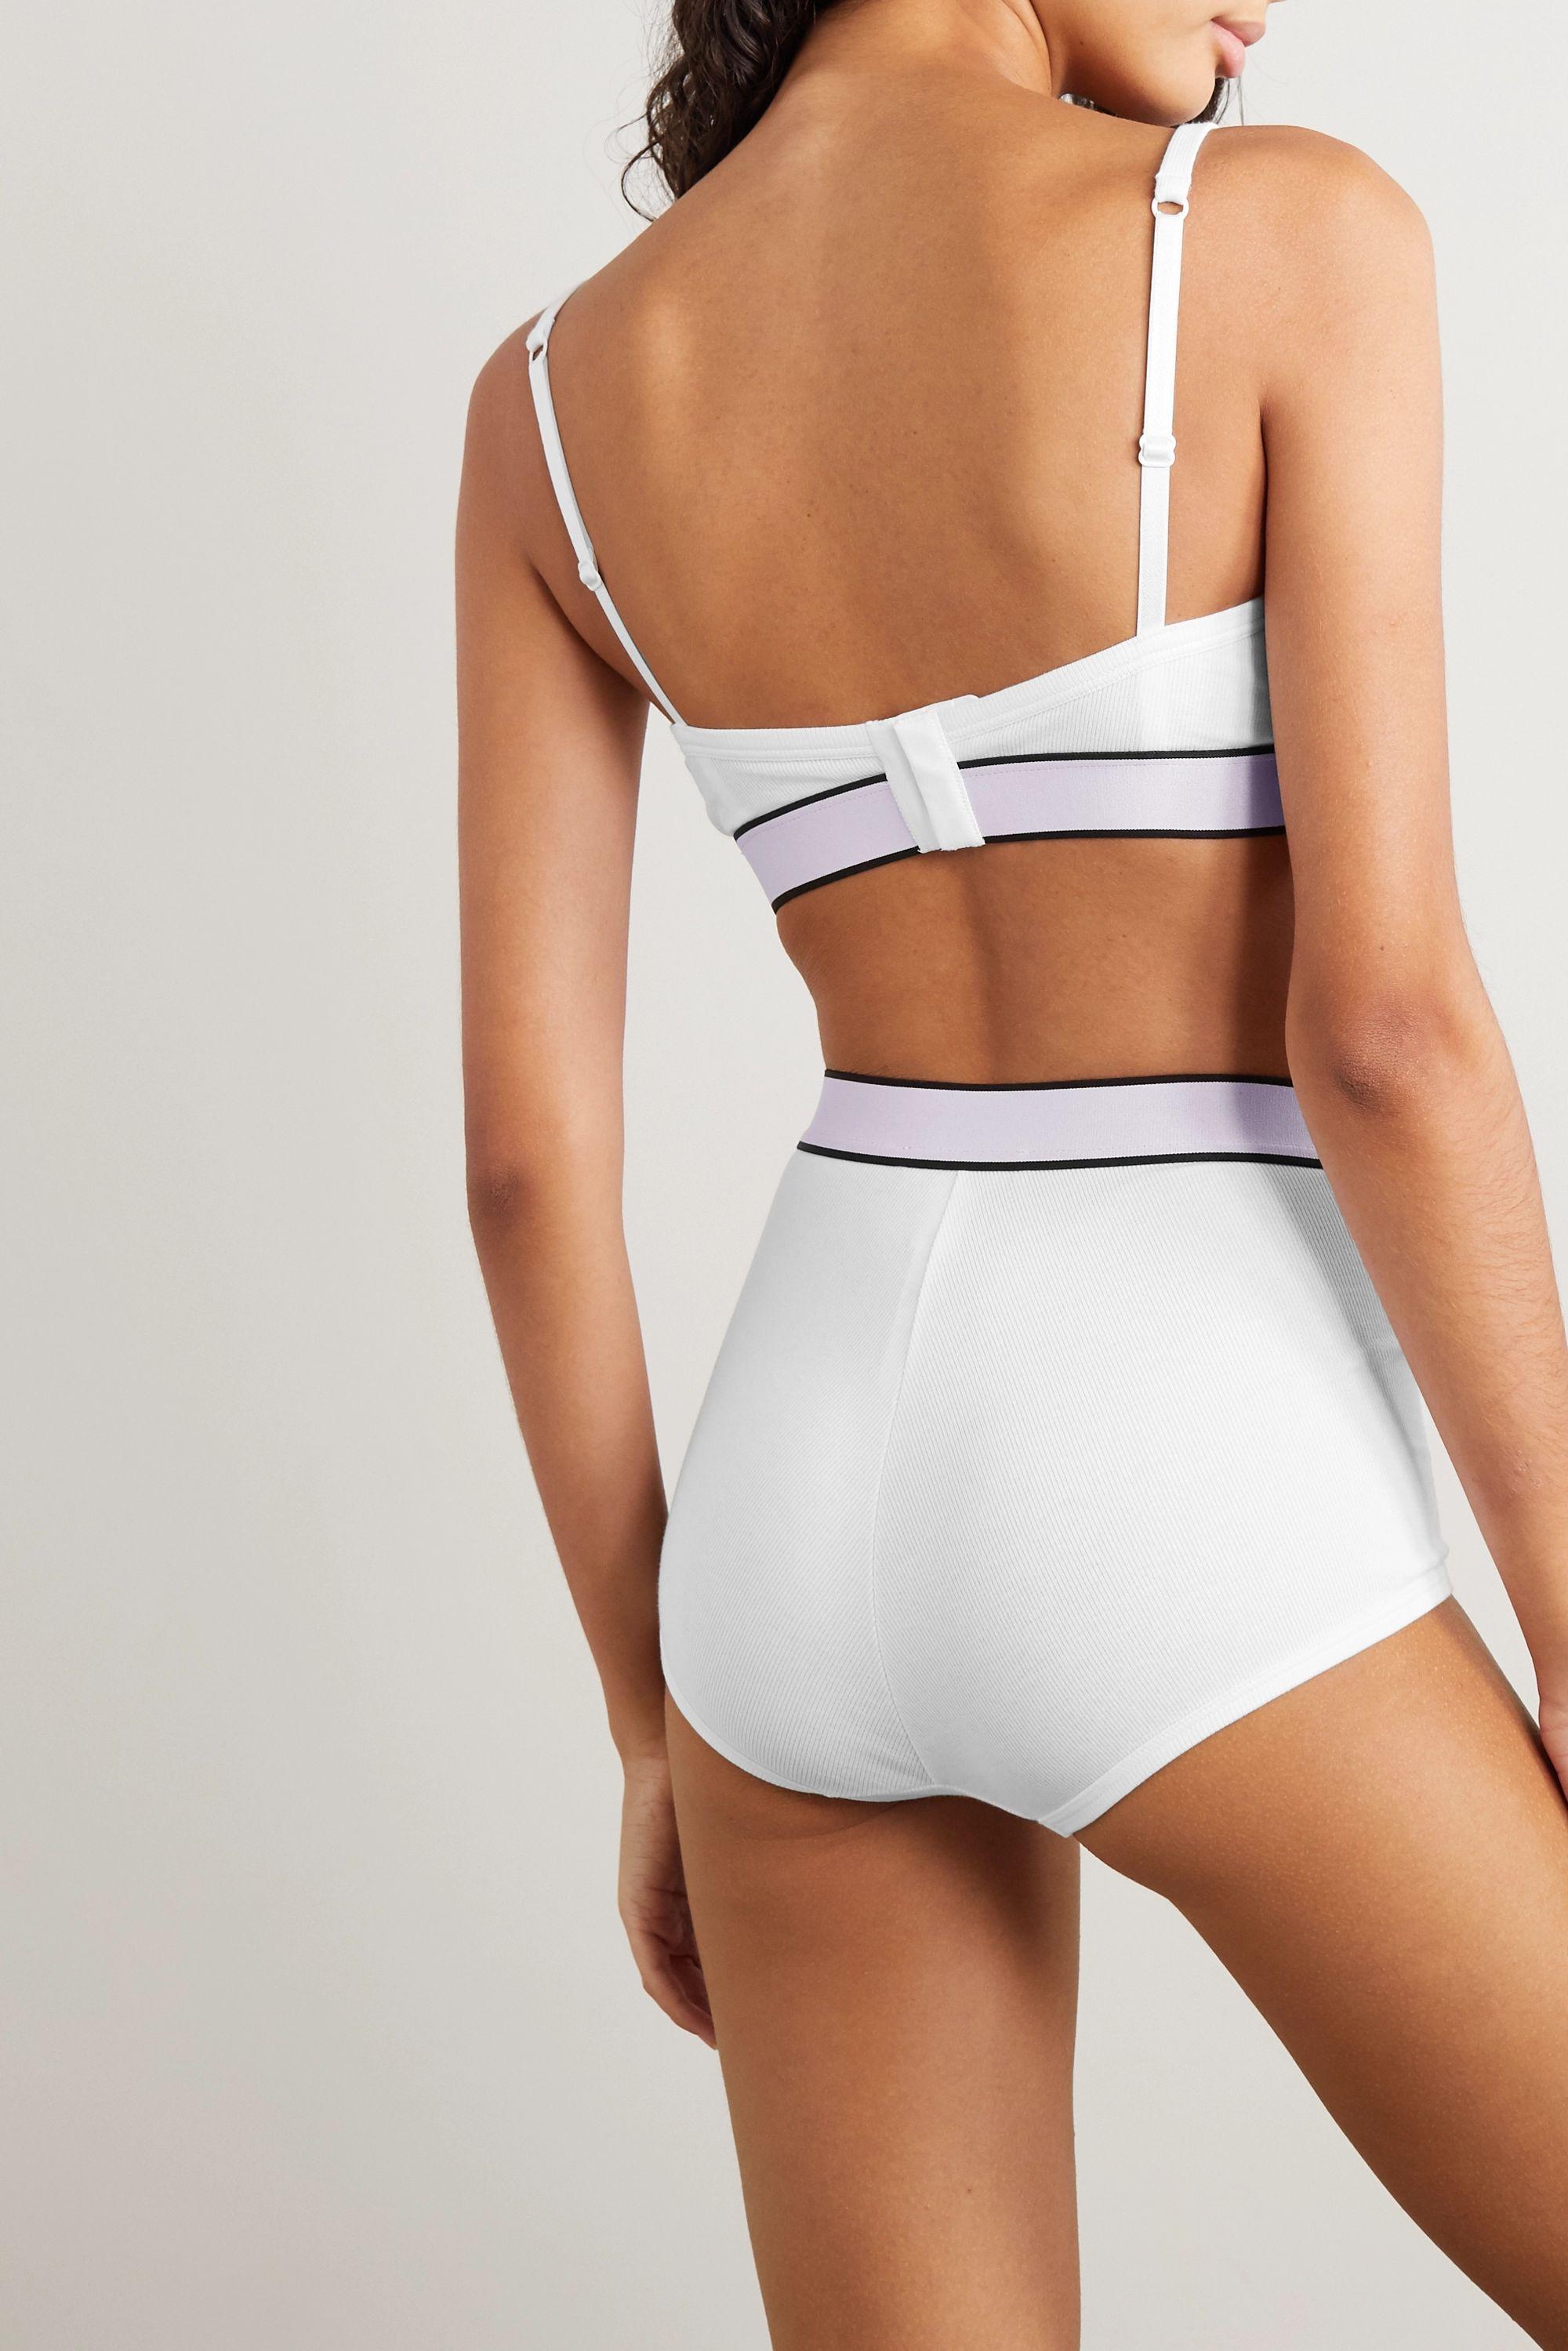 Dolce & Gabbana Generation Z ribbed stretch-cotton jersey briefs